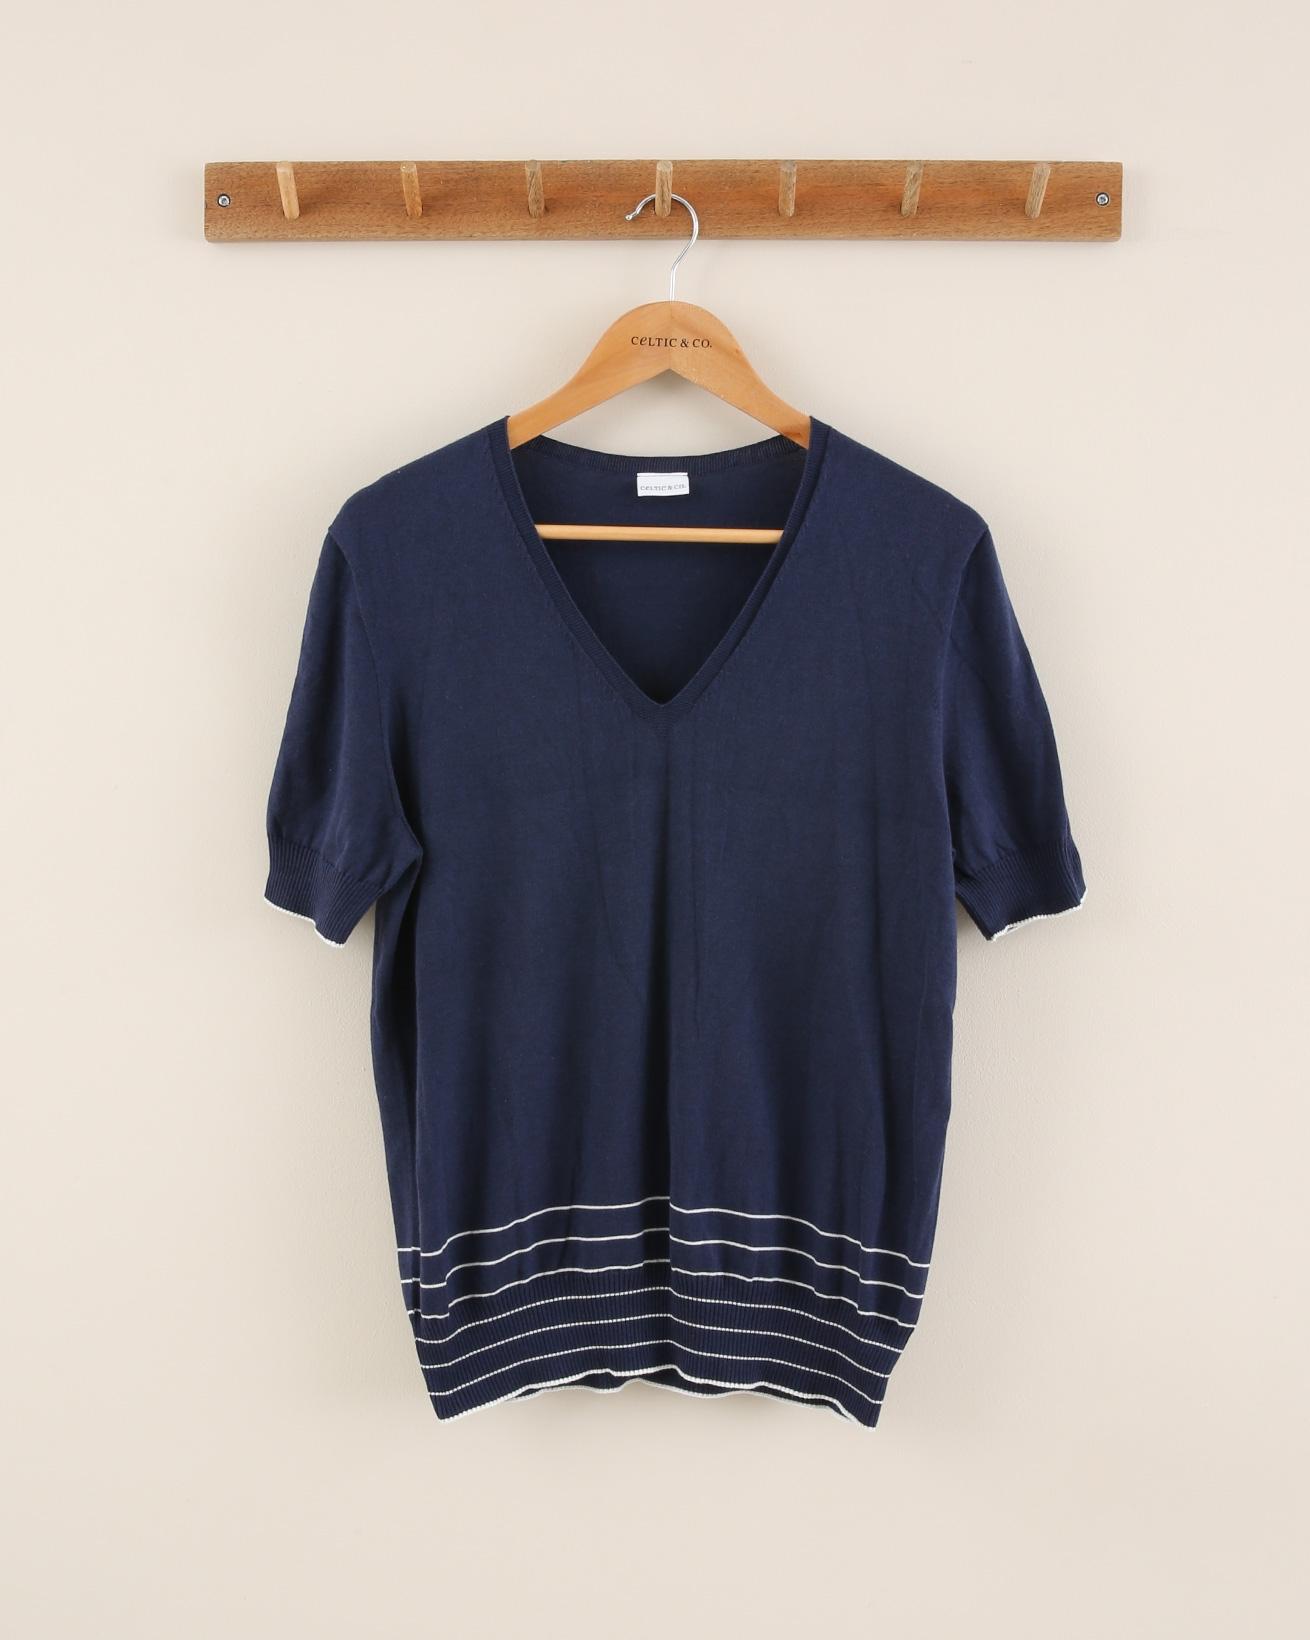 Cotton short sleeve tee - Size Small - Indigo / Pearl - 1845